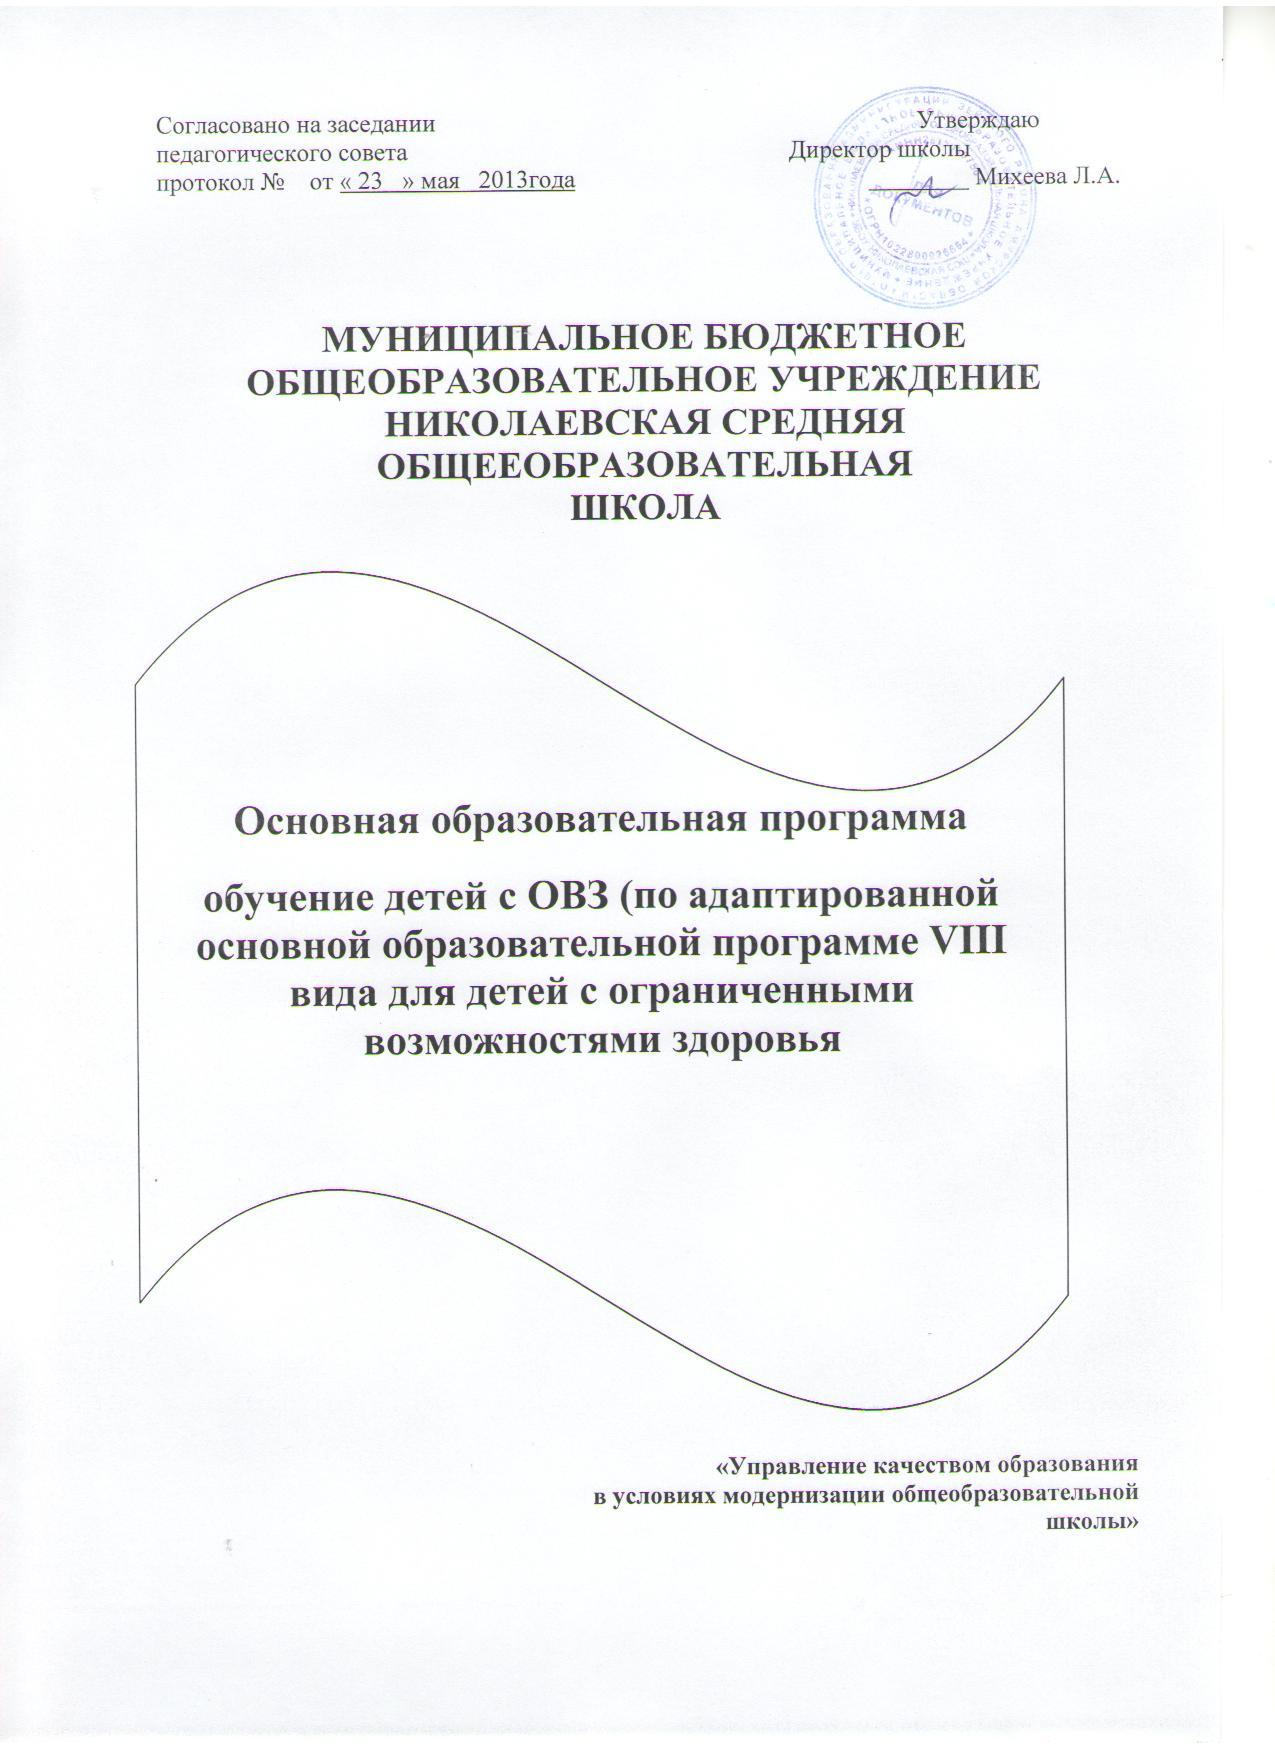 C:\Documents and Settings\Admin\Рабочий стол\основна образовательная1.jpg